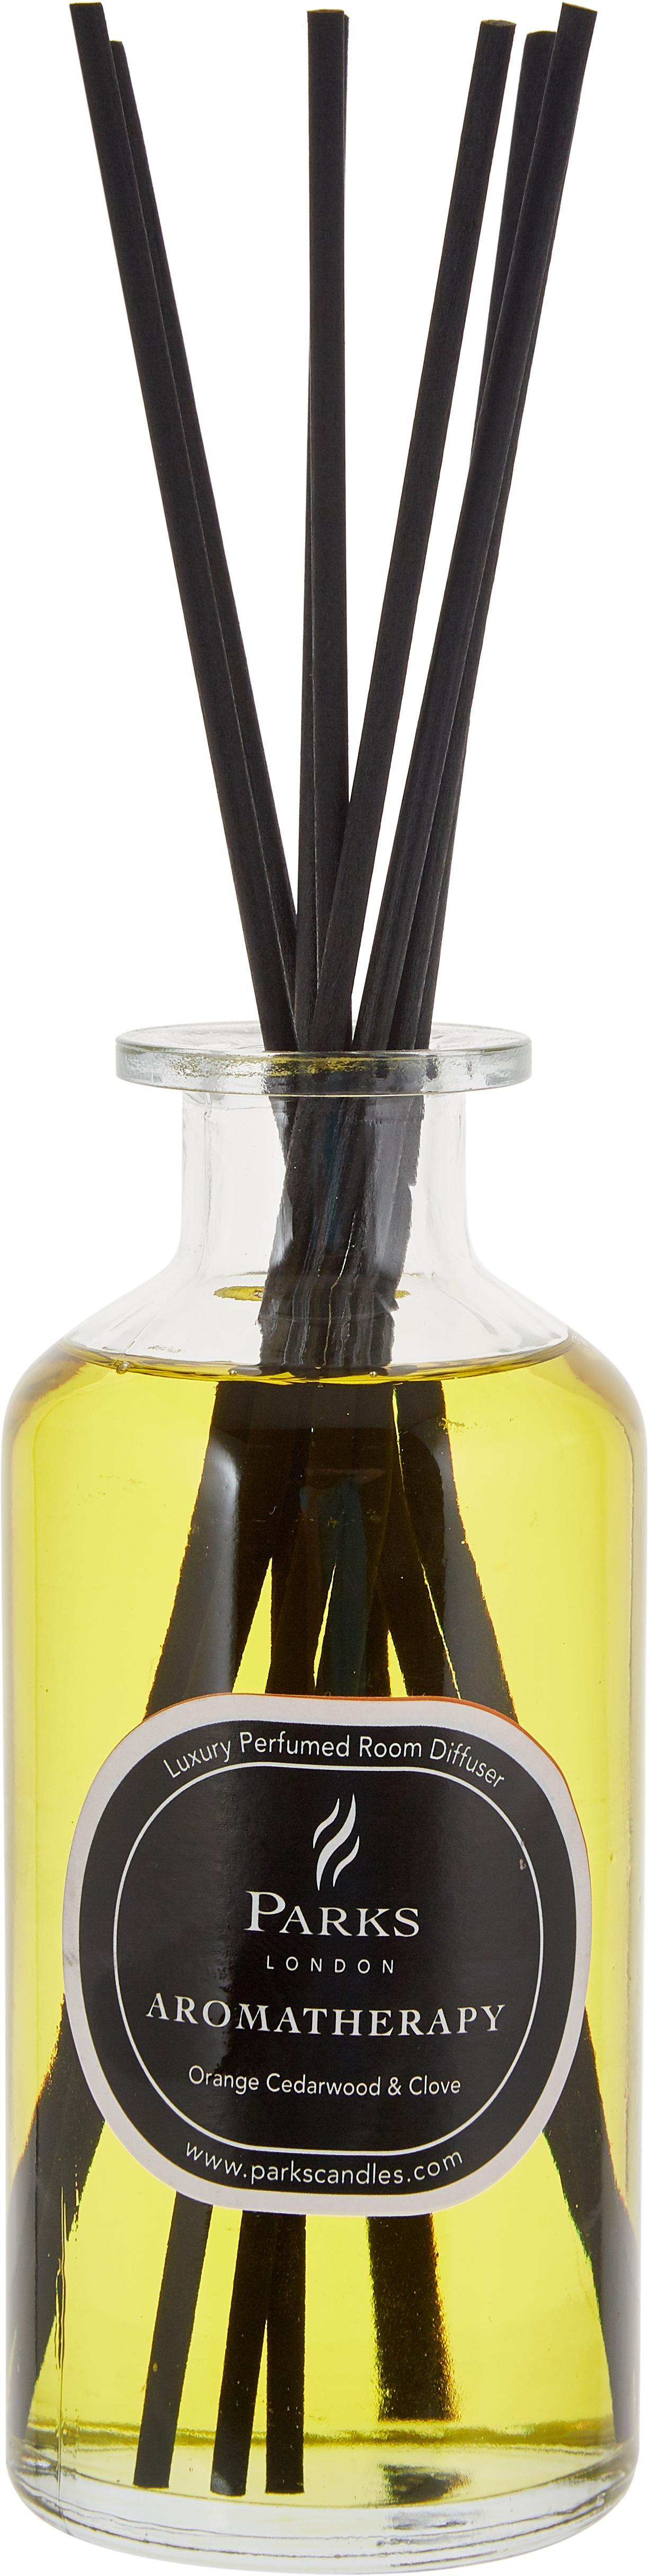 Diffuser Aromatherapy (sinaasappel, cederhout & kruidnagel), Sluiting: hout, Zwart, wit, Ø 6 x H 14 cm